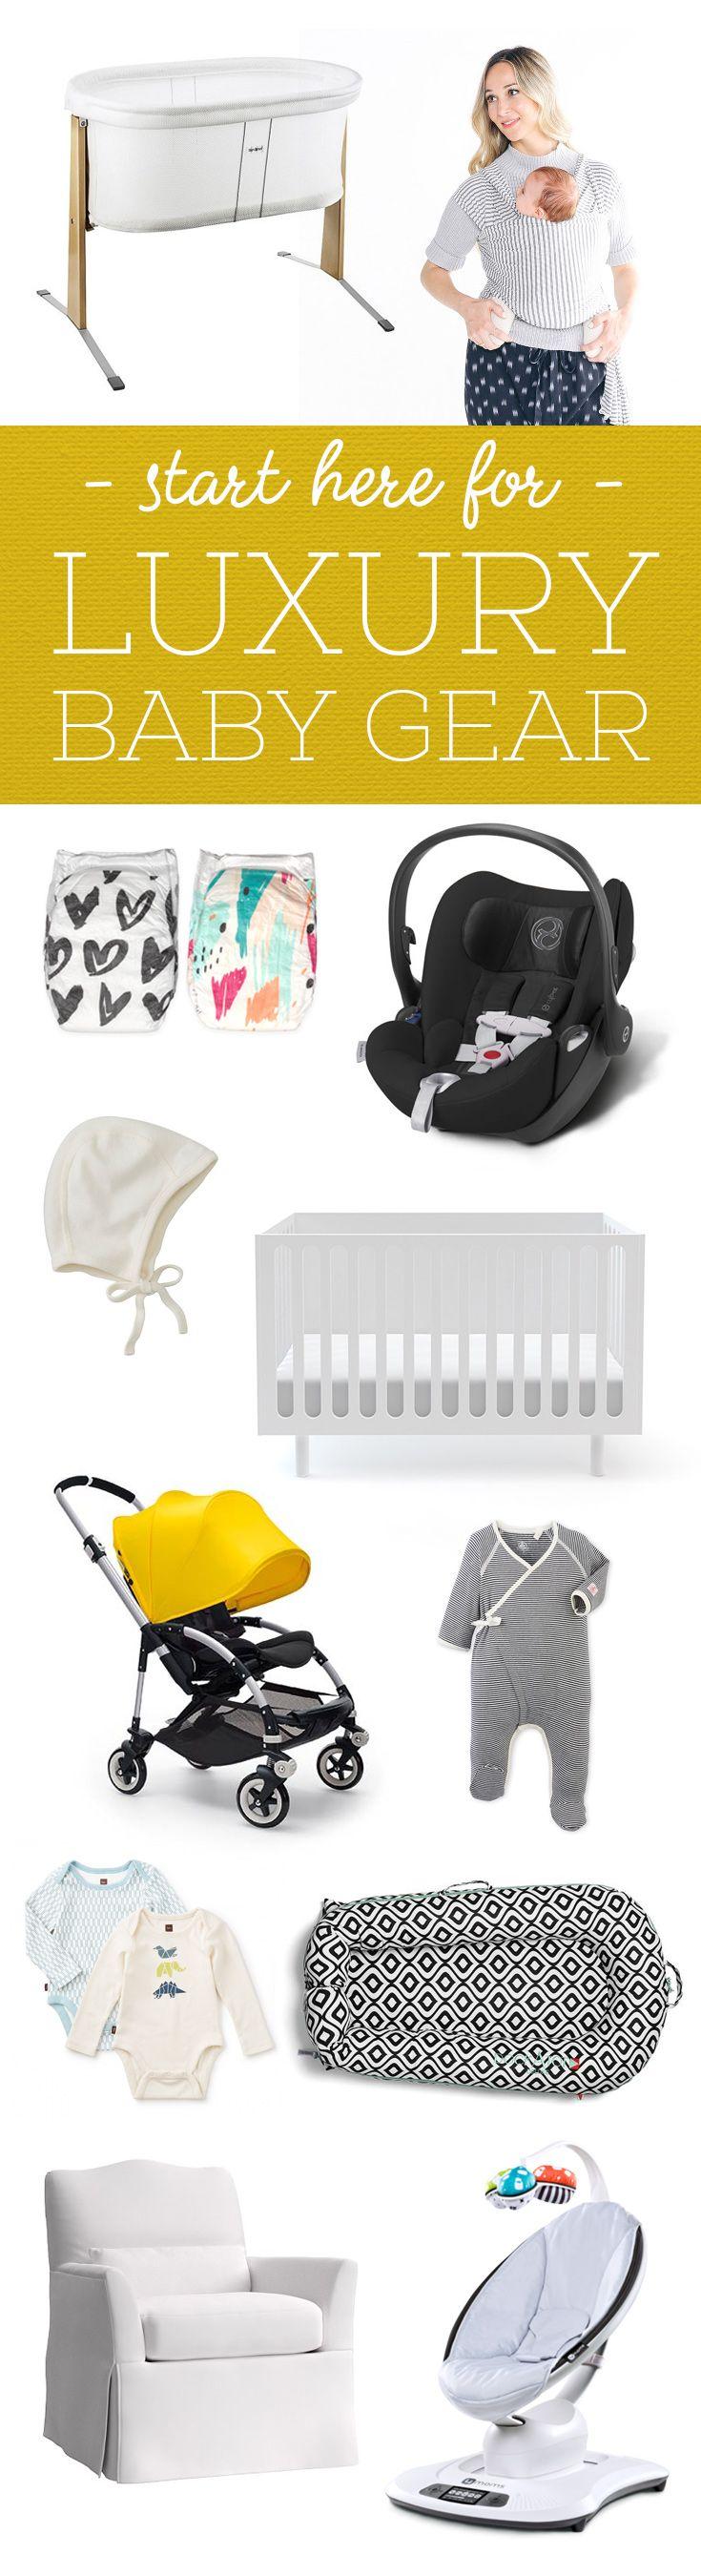 2417 best Baby registry images on Pinterest